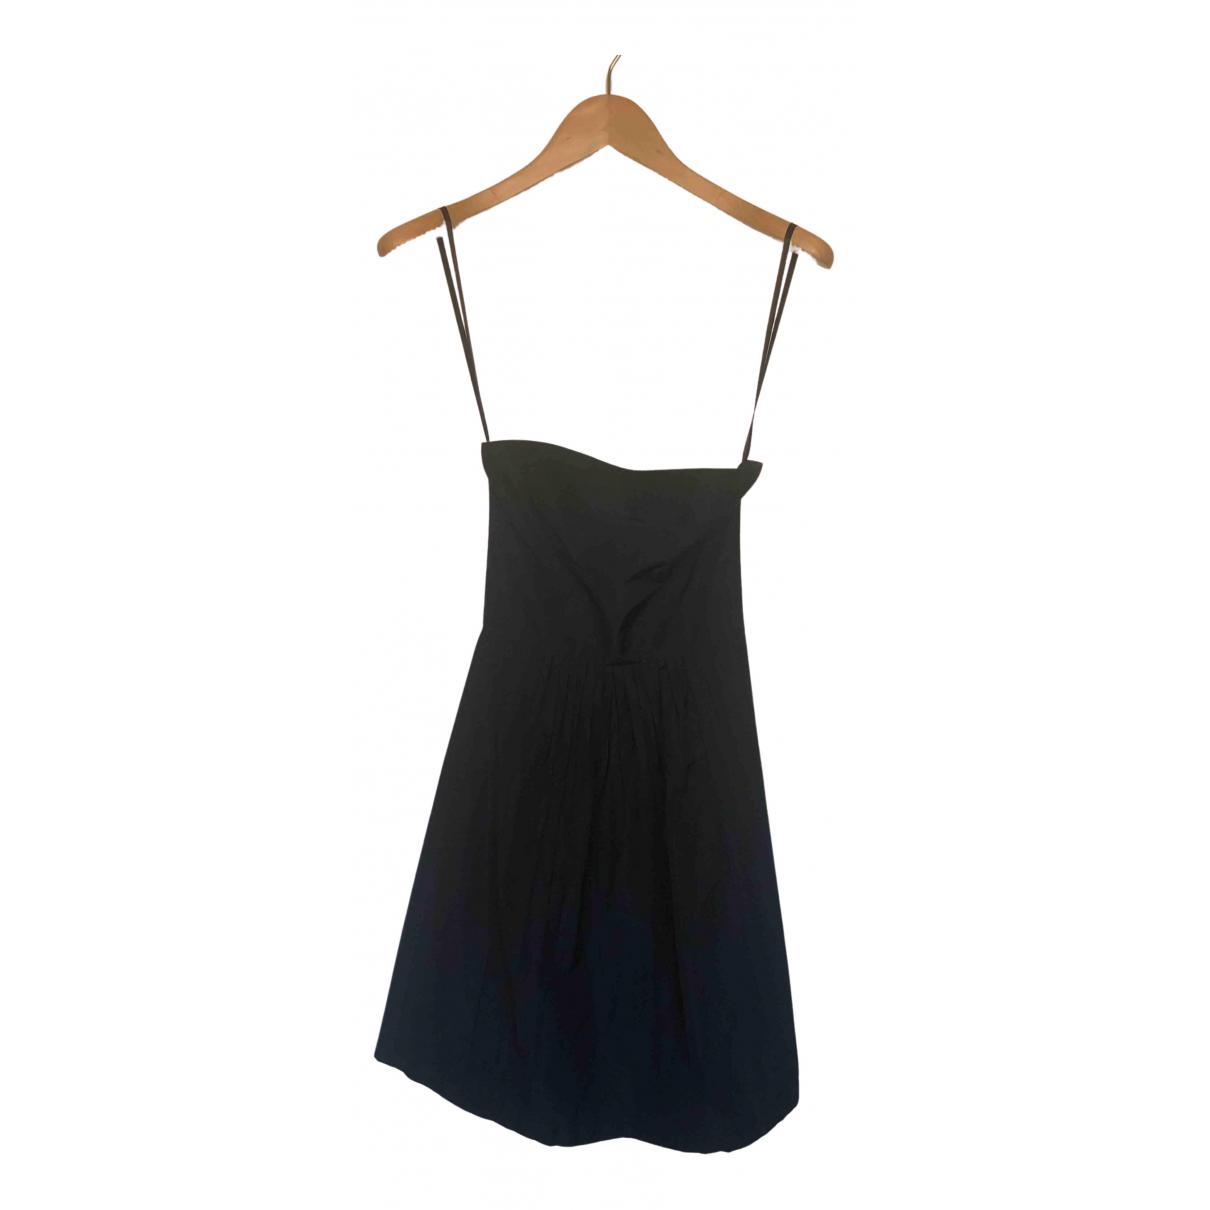 Theory N Black dress for Women 0 0-5